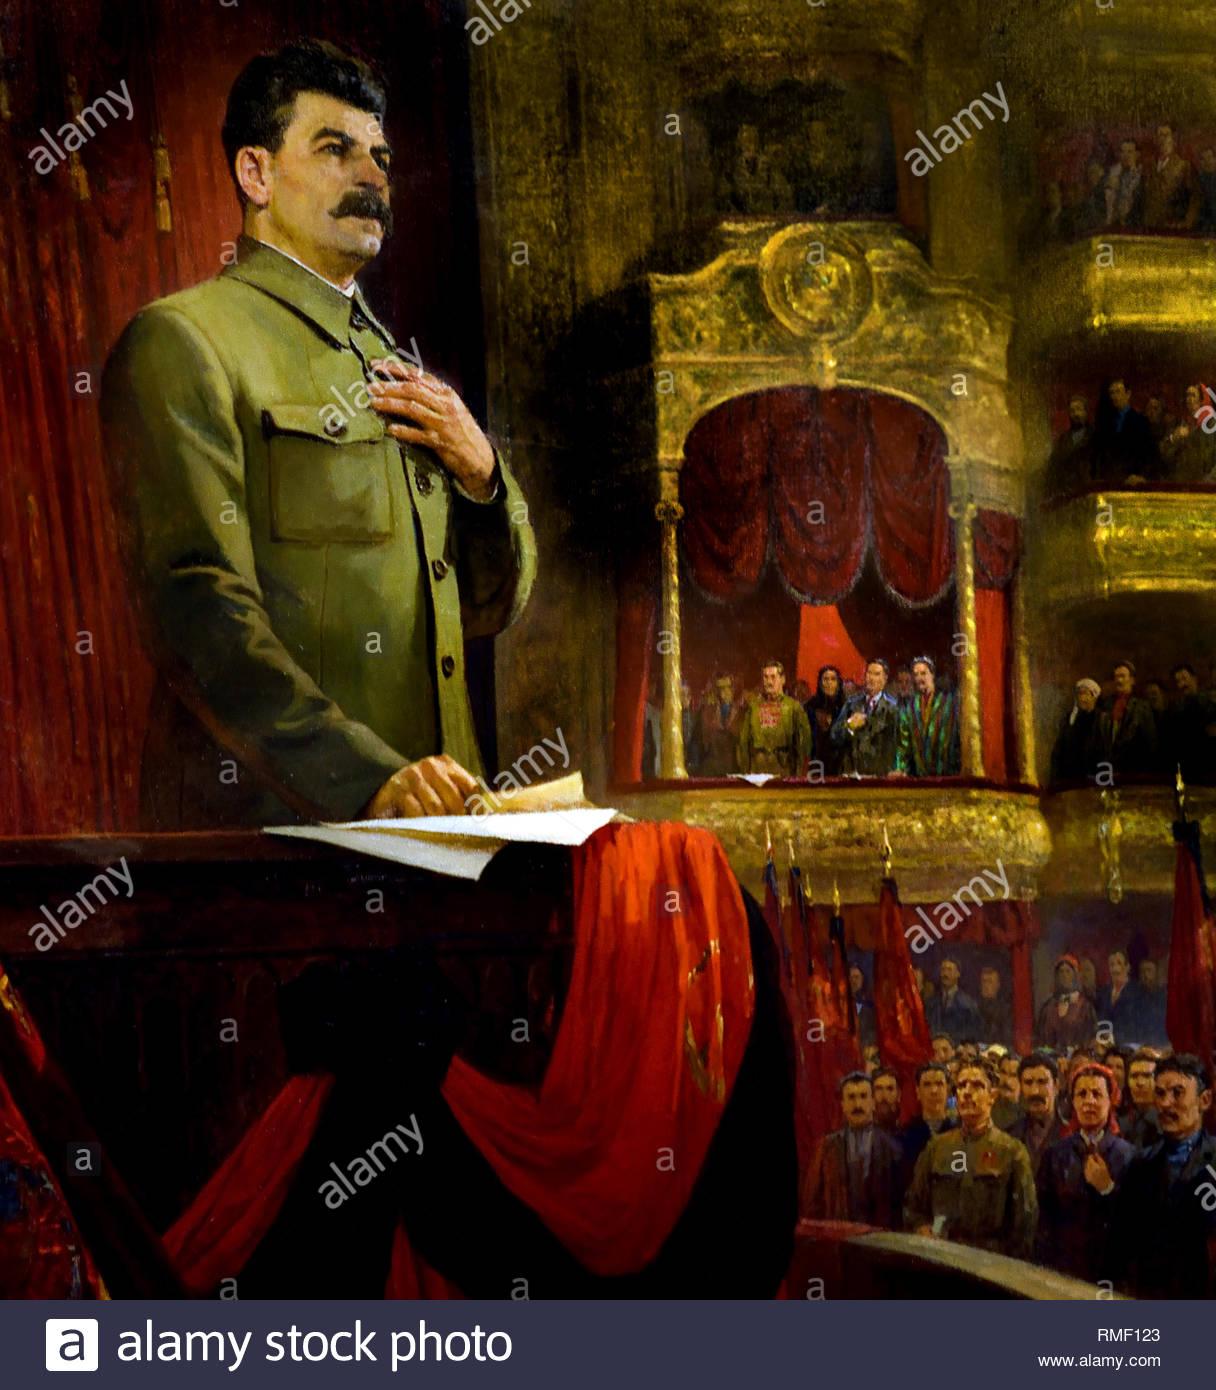 Formation of the USSR on December 30, 1922 Joseph Stalin. Soviet Union Communist Propaganda (Russia under Lenin and Stalin1921-1953 ). - Stock Image